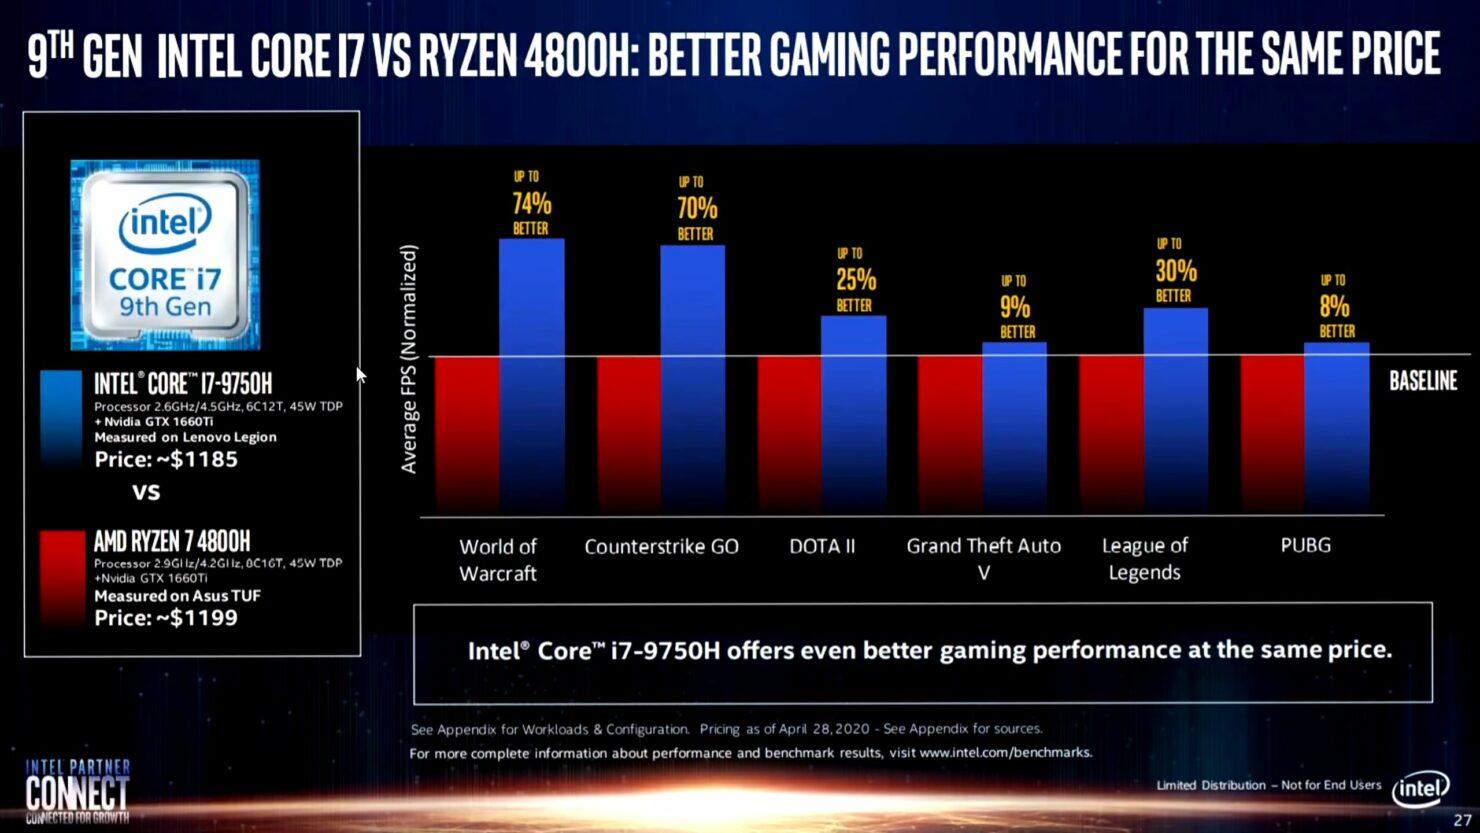 intel-real-world-performance-benchmarks_amd-ryzen-4000_amd-ryzen-3000_intel-10th-gen_intel-9th-gen-cpus_14